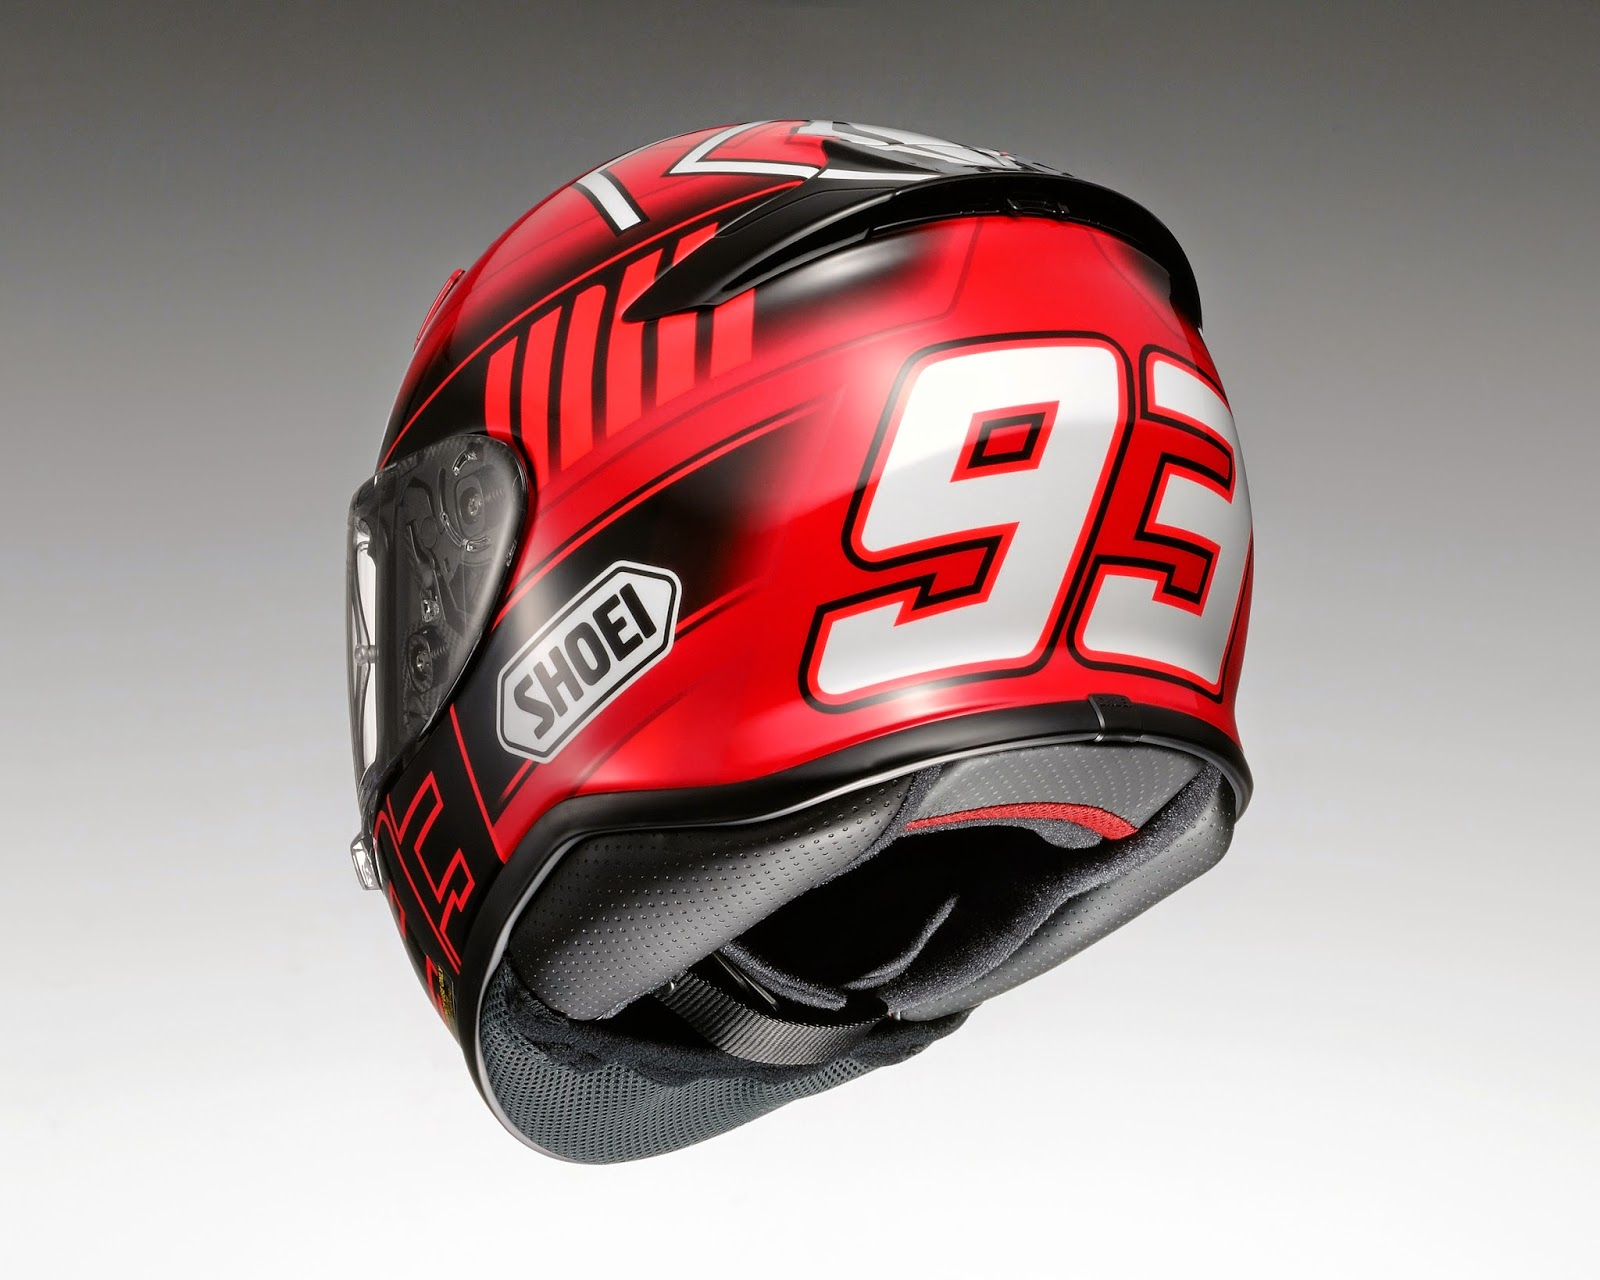 Champion Helmets New 2015 Shoei Marc Marquez Helmets